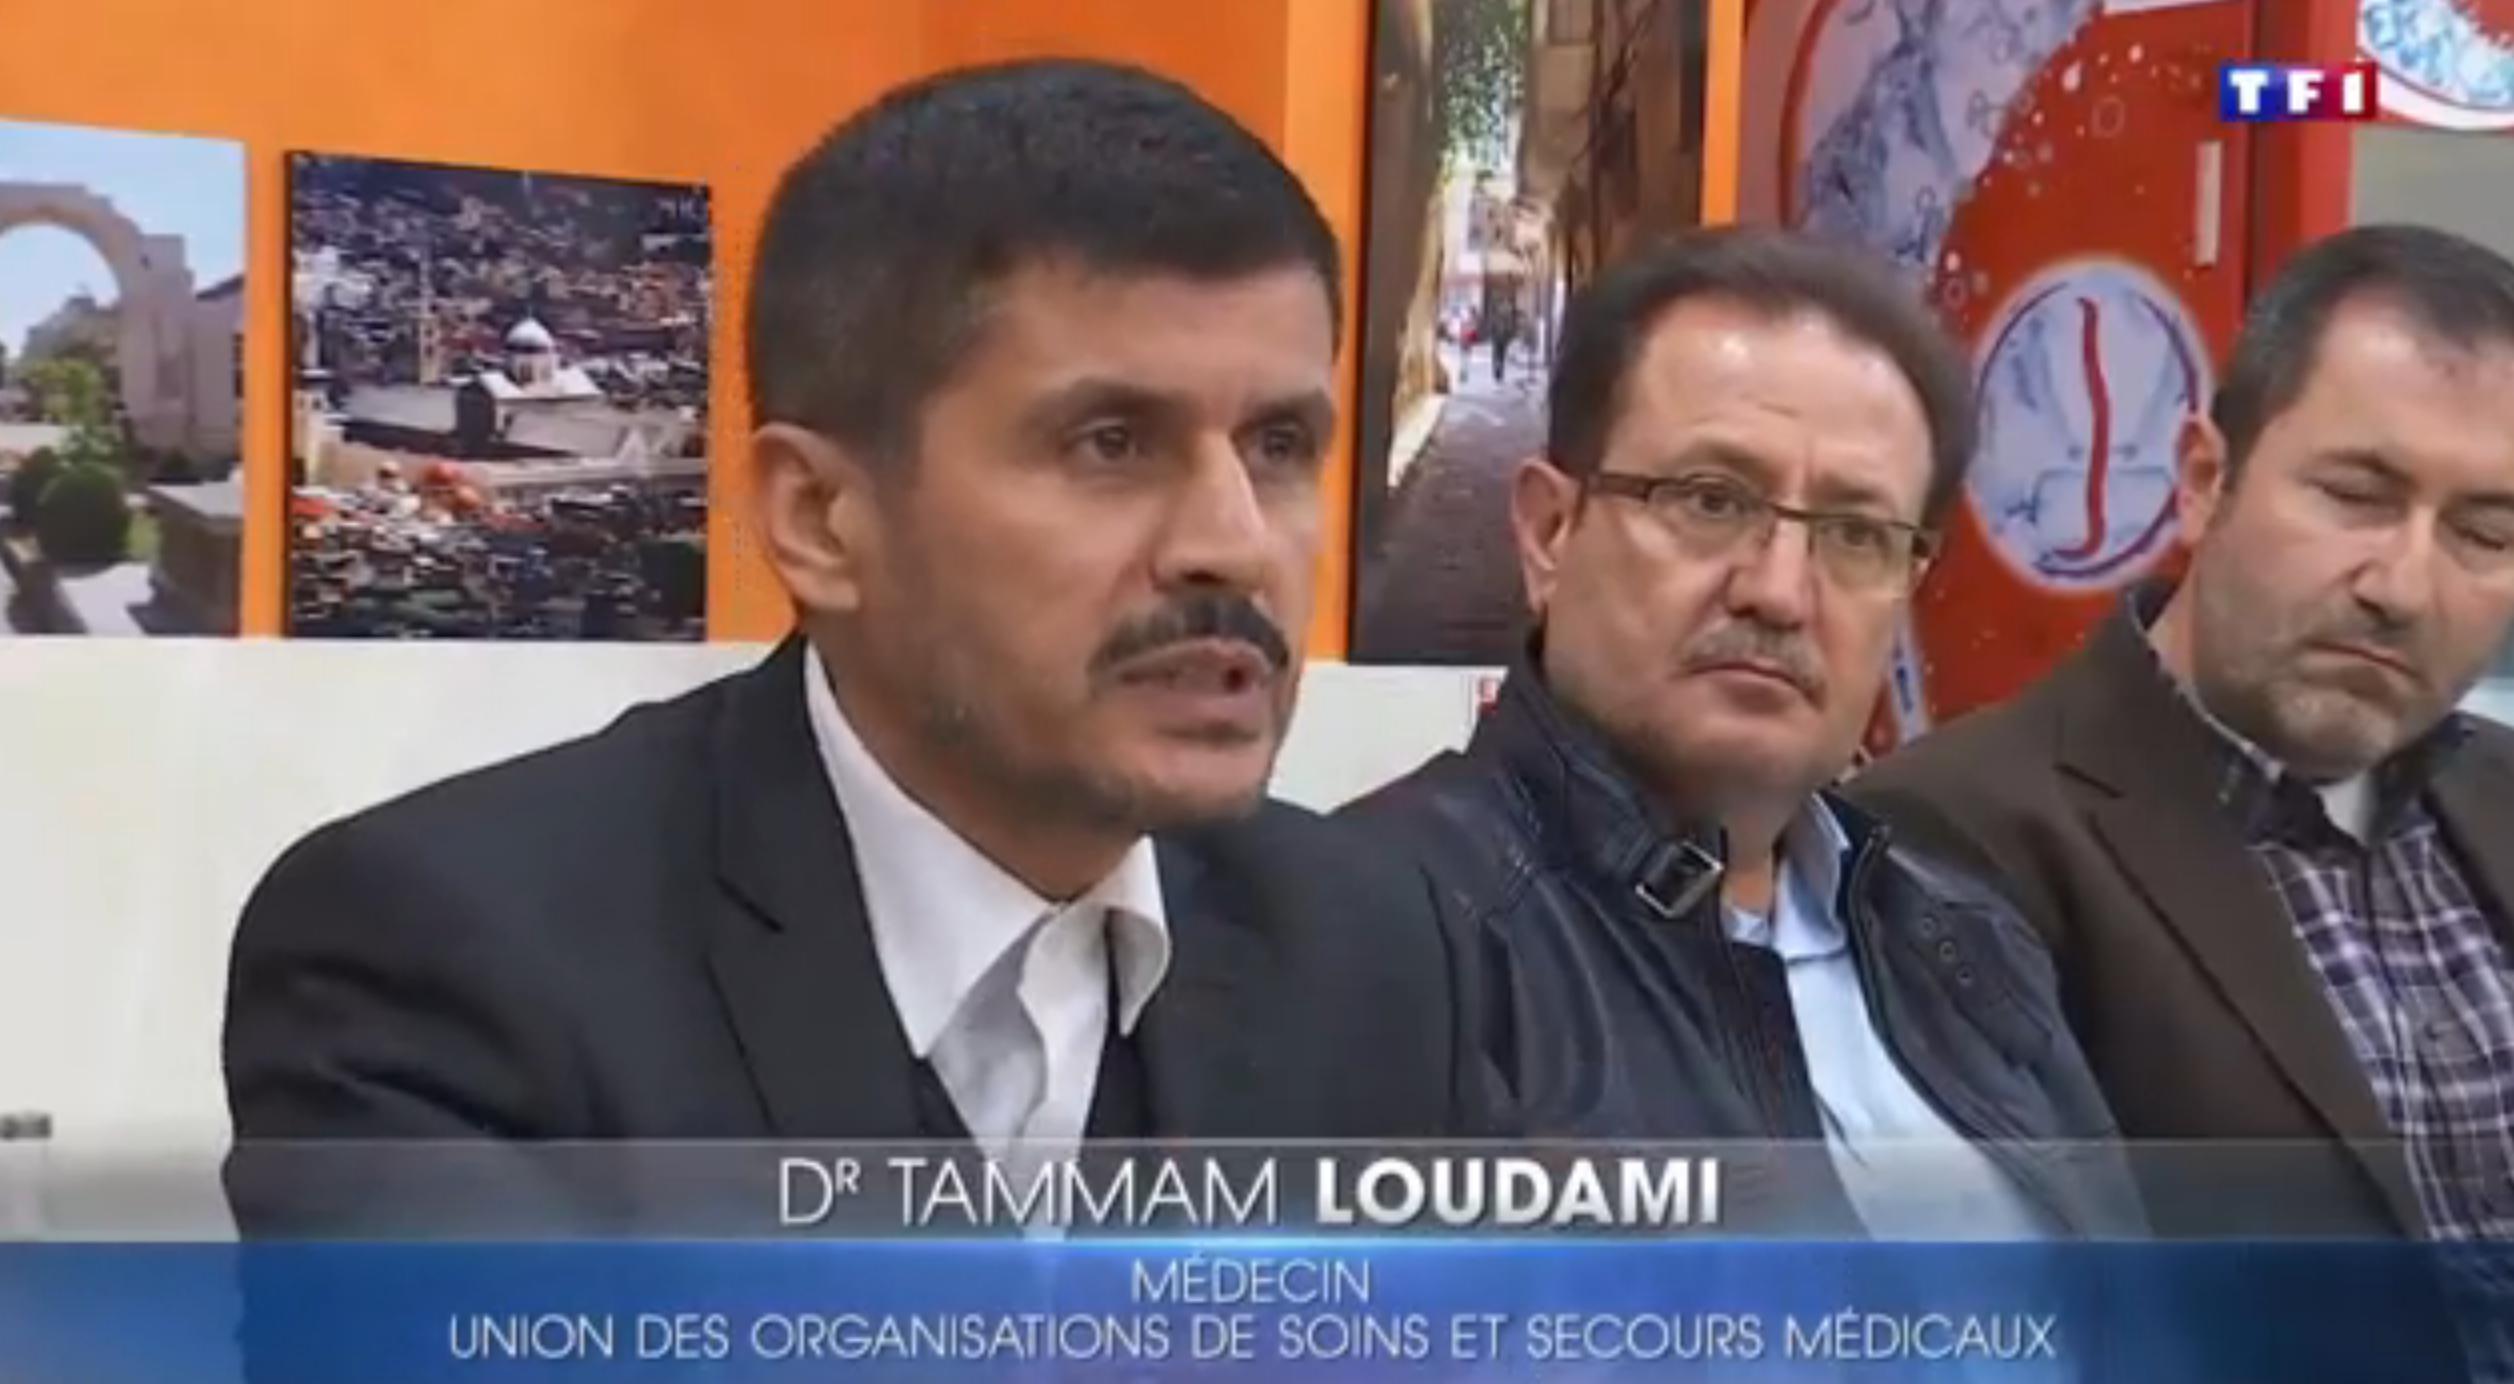 Tammam_Loudami_TF1.png